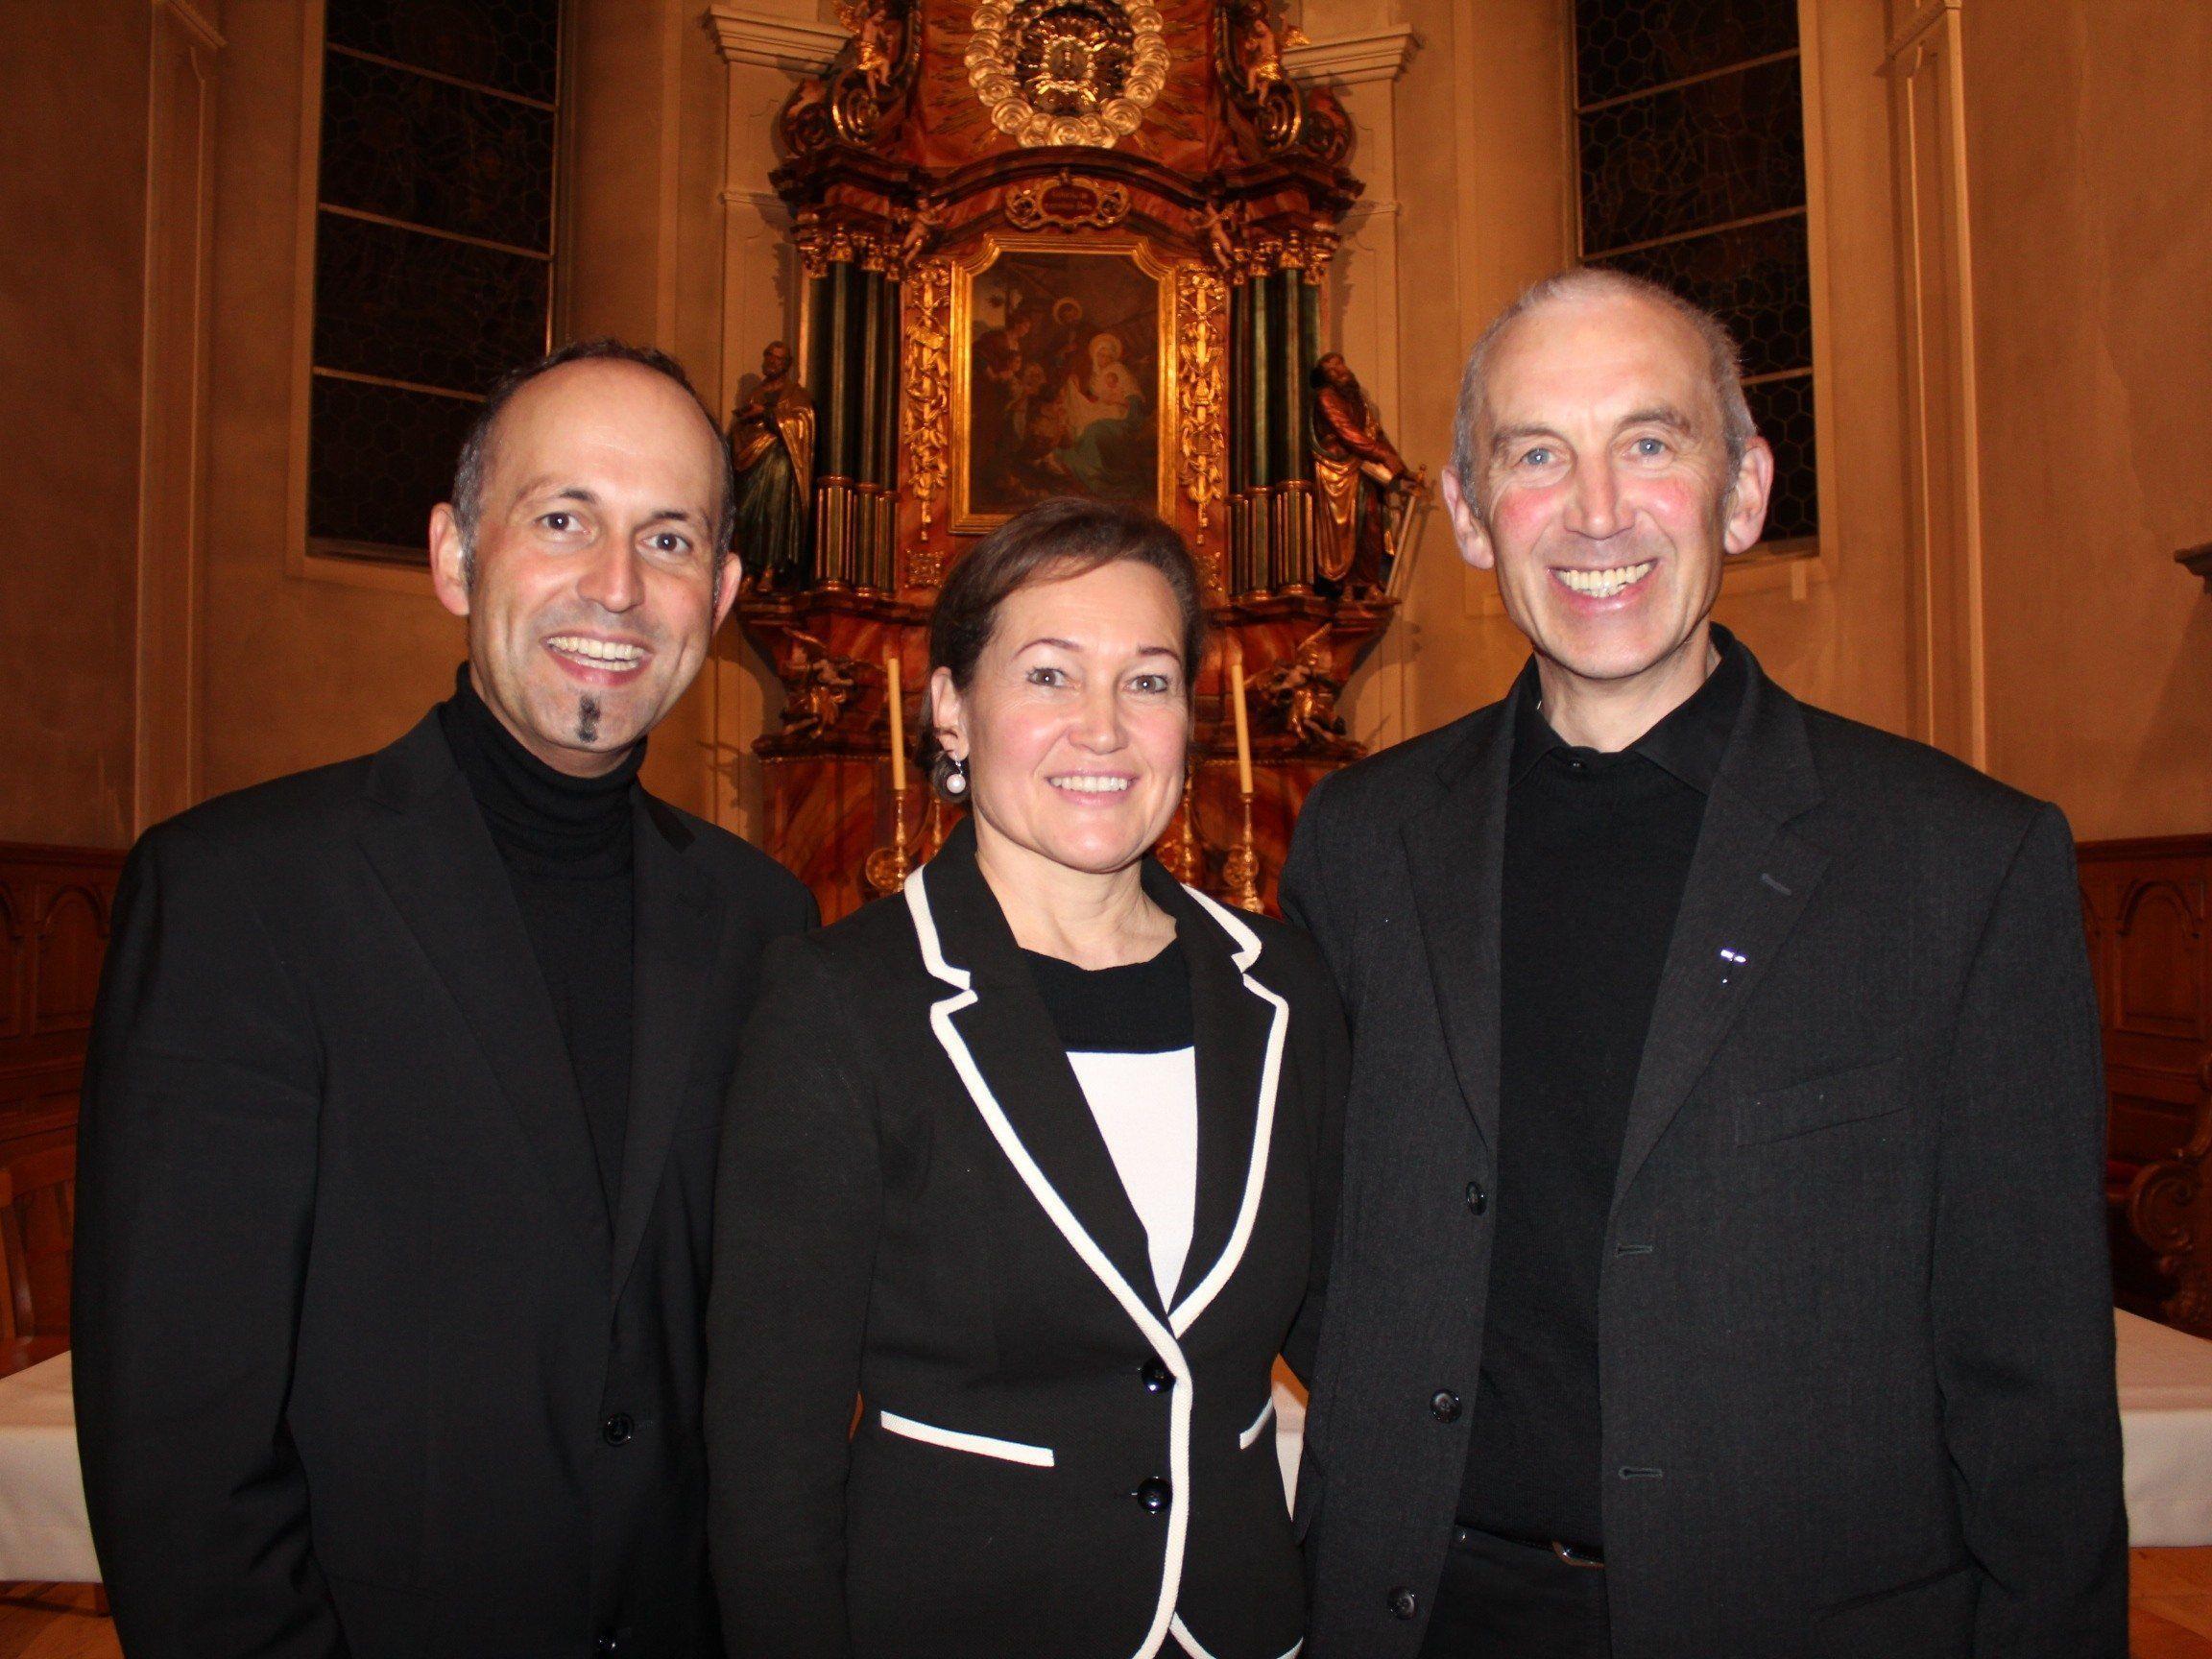 Domkapellmeister Benjamin Lack, Birgit Plankel und Pfarrer Paul Burtscher.